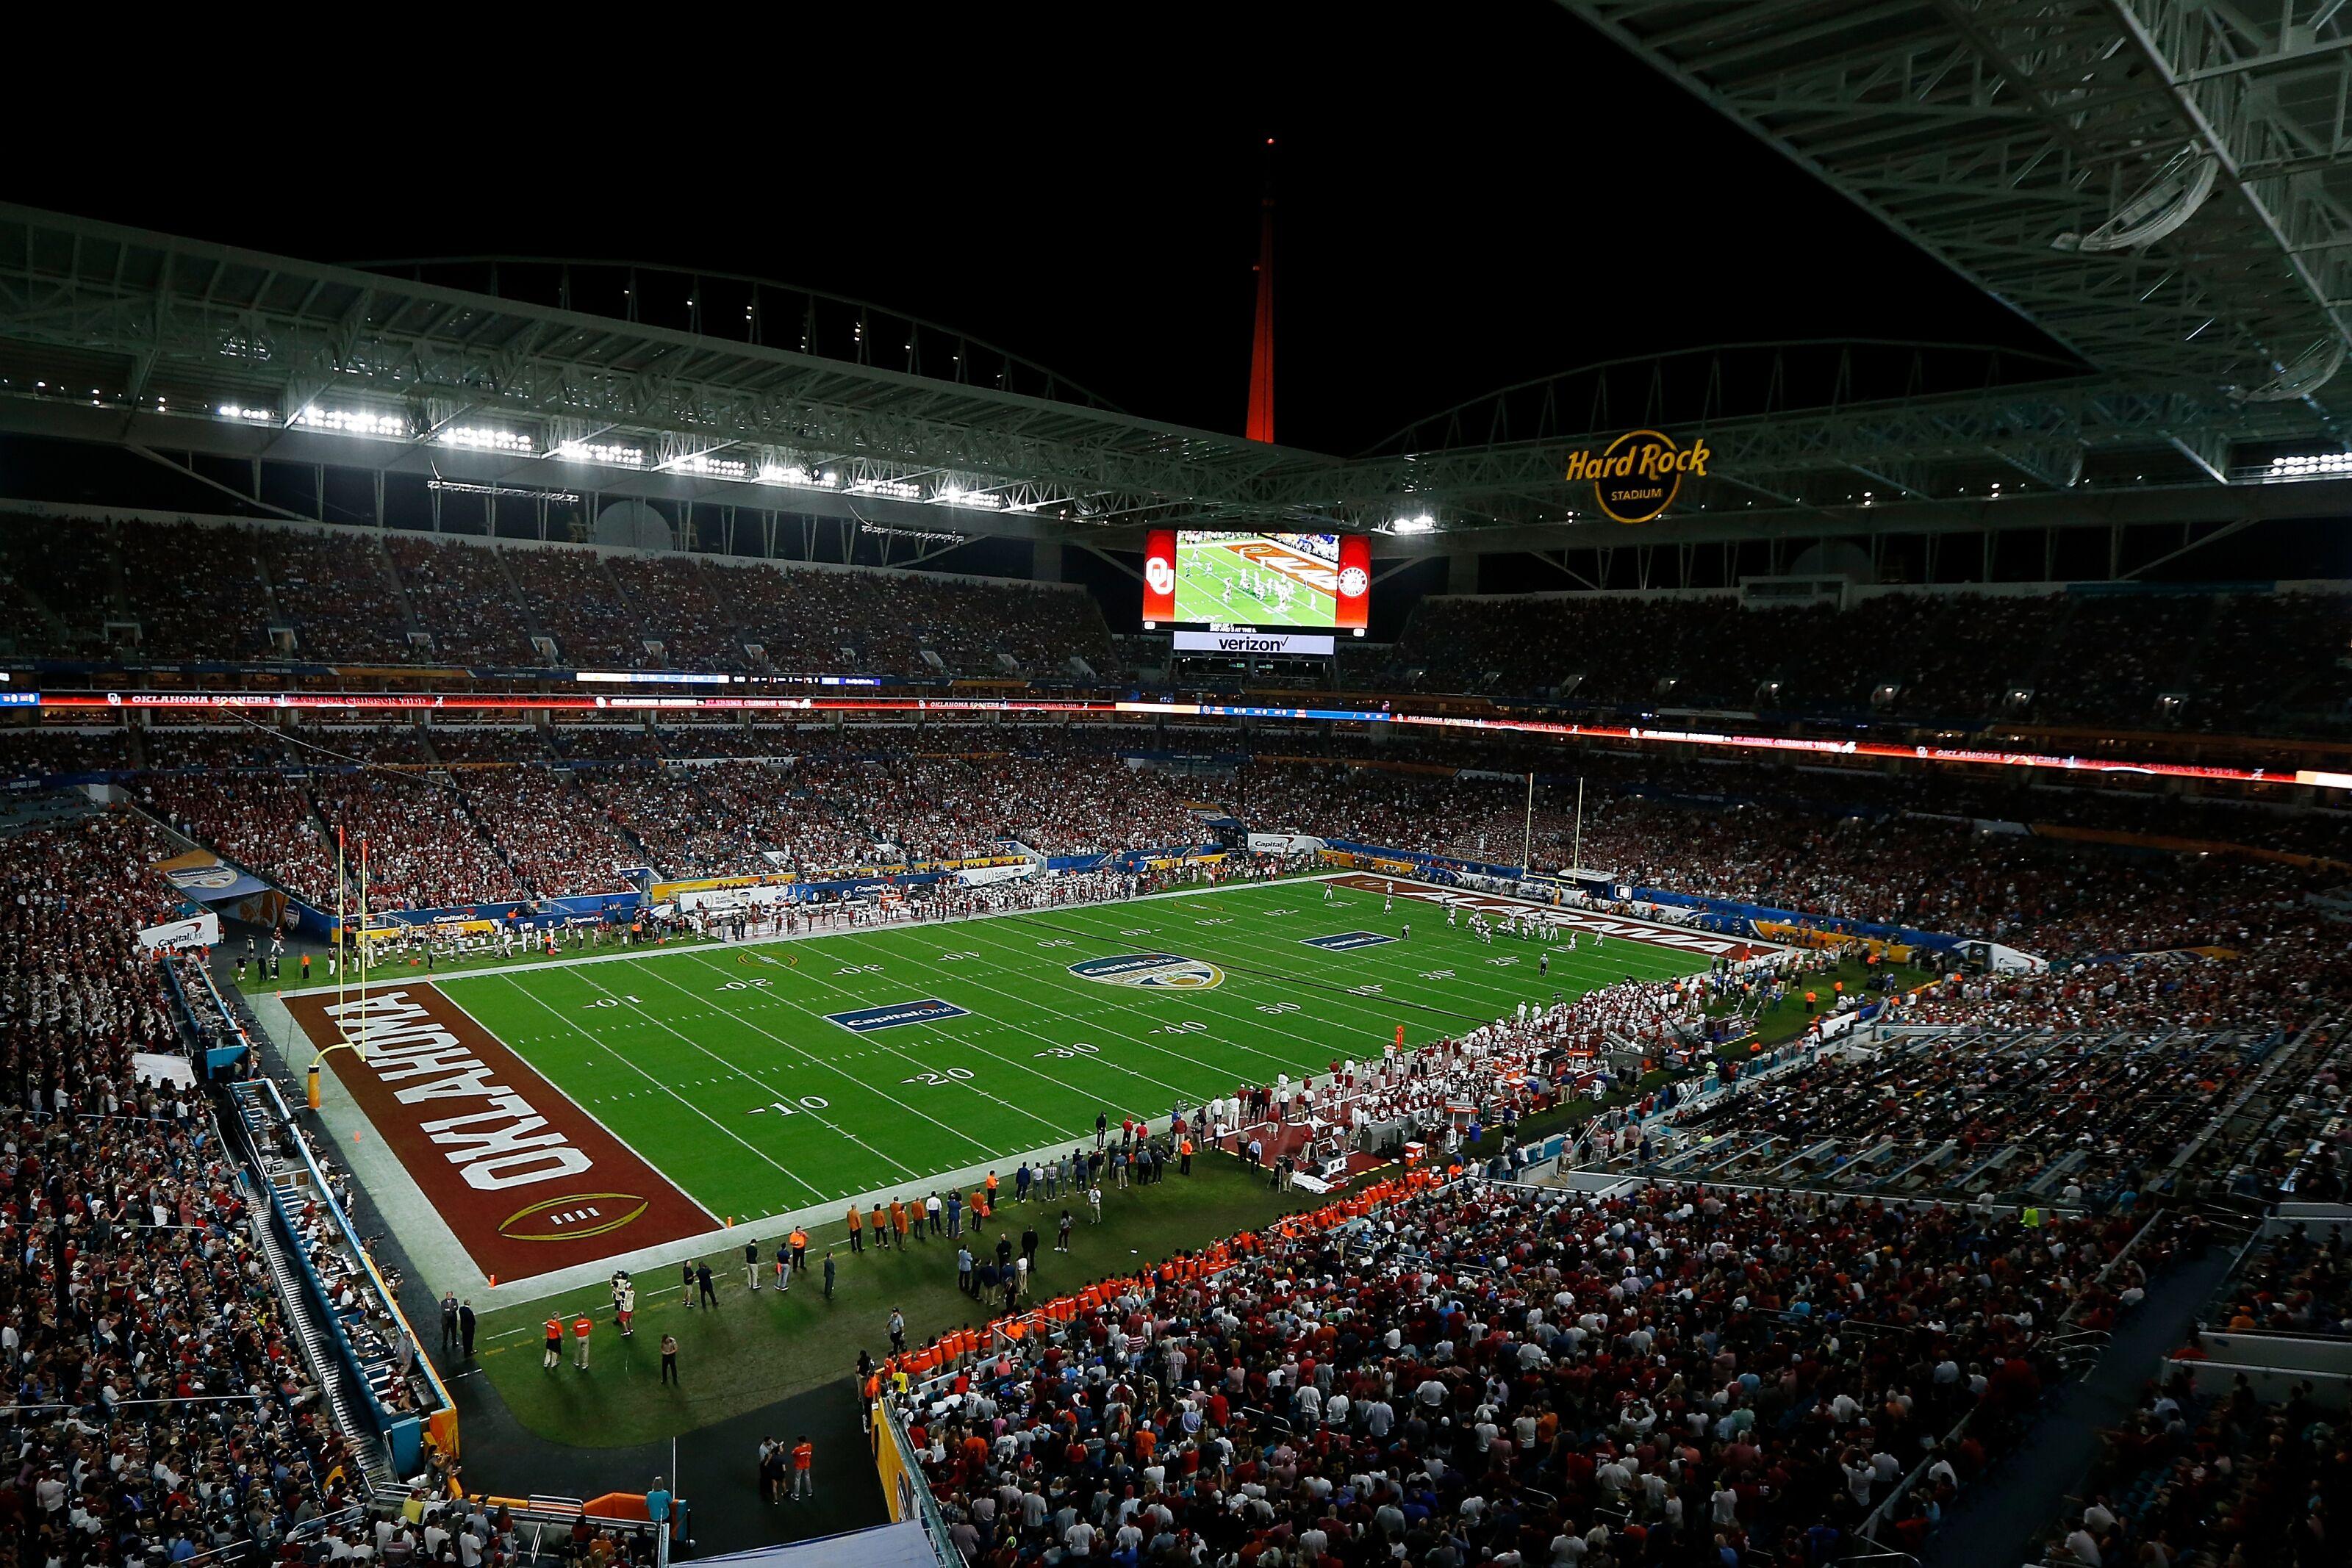 Oklahoma football: Sooners are 21st century championship pedigree